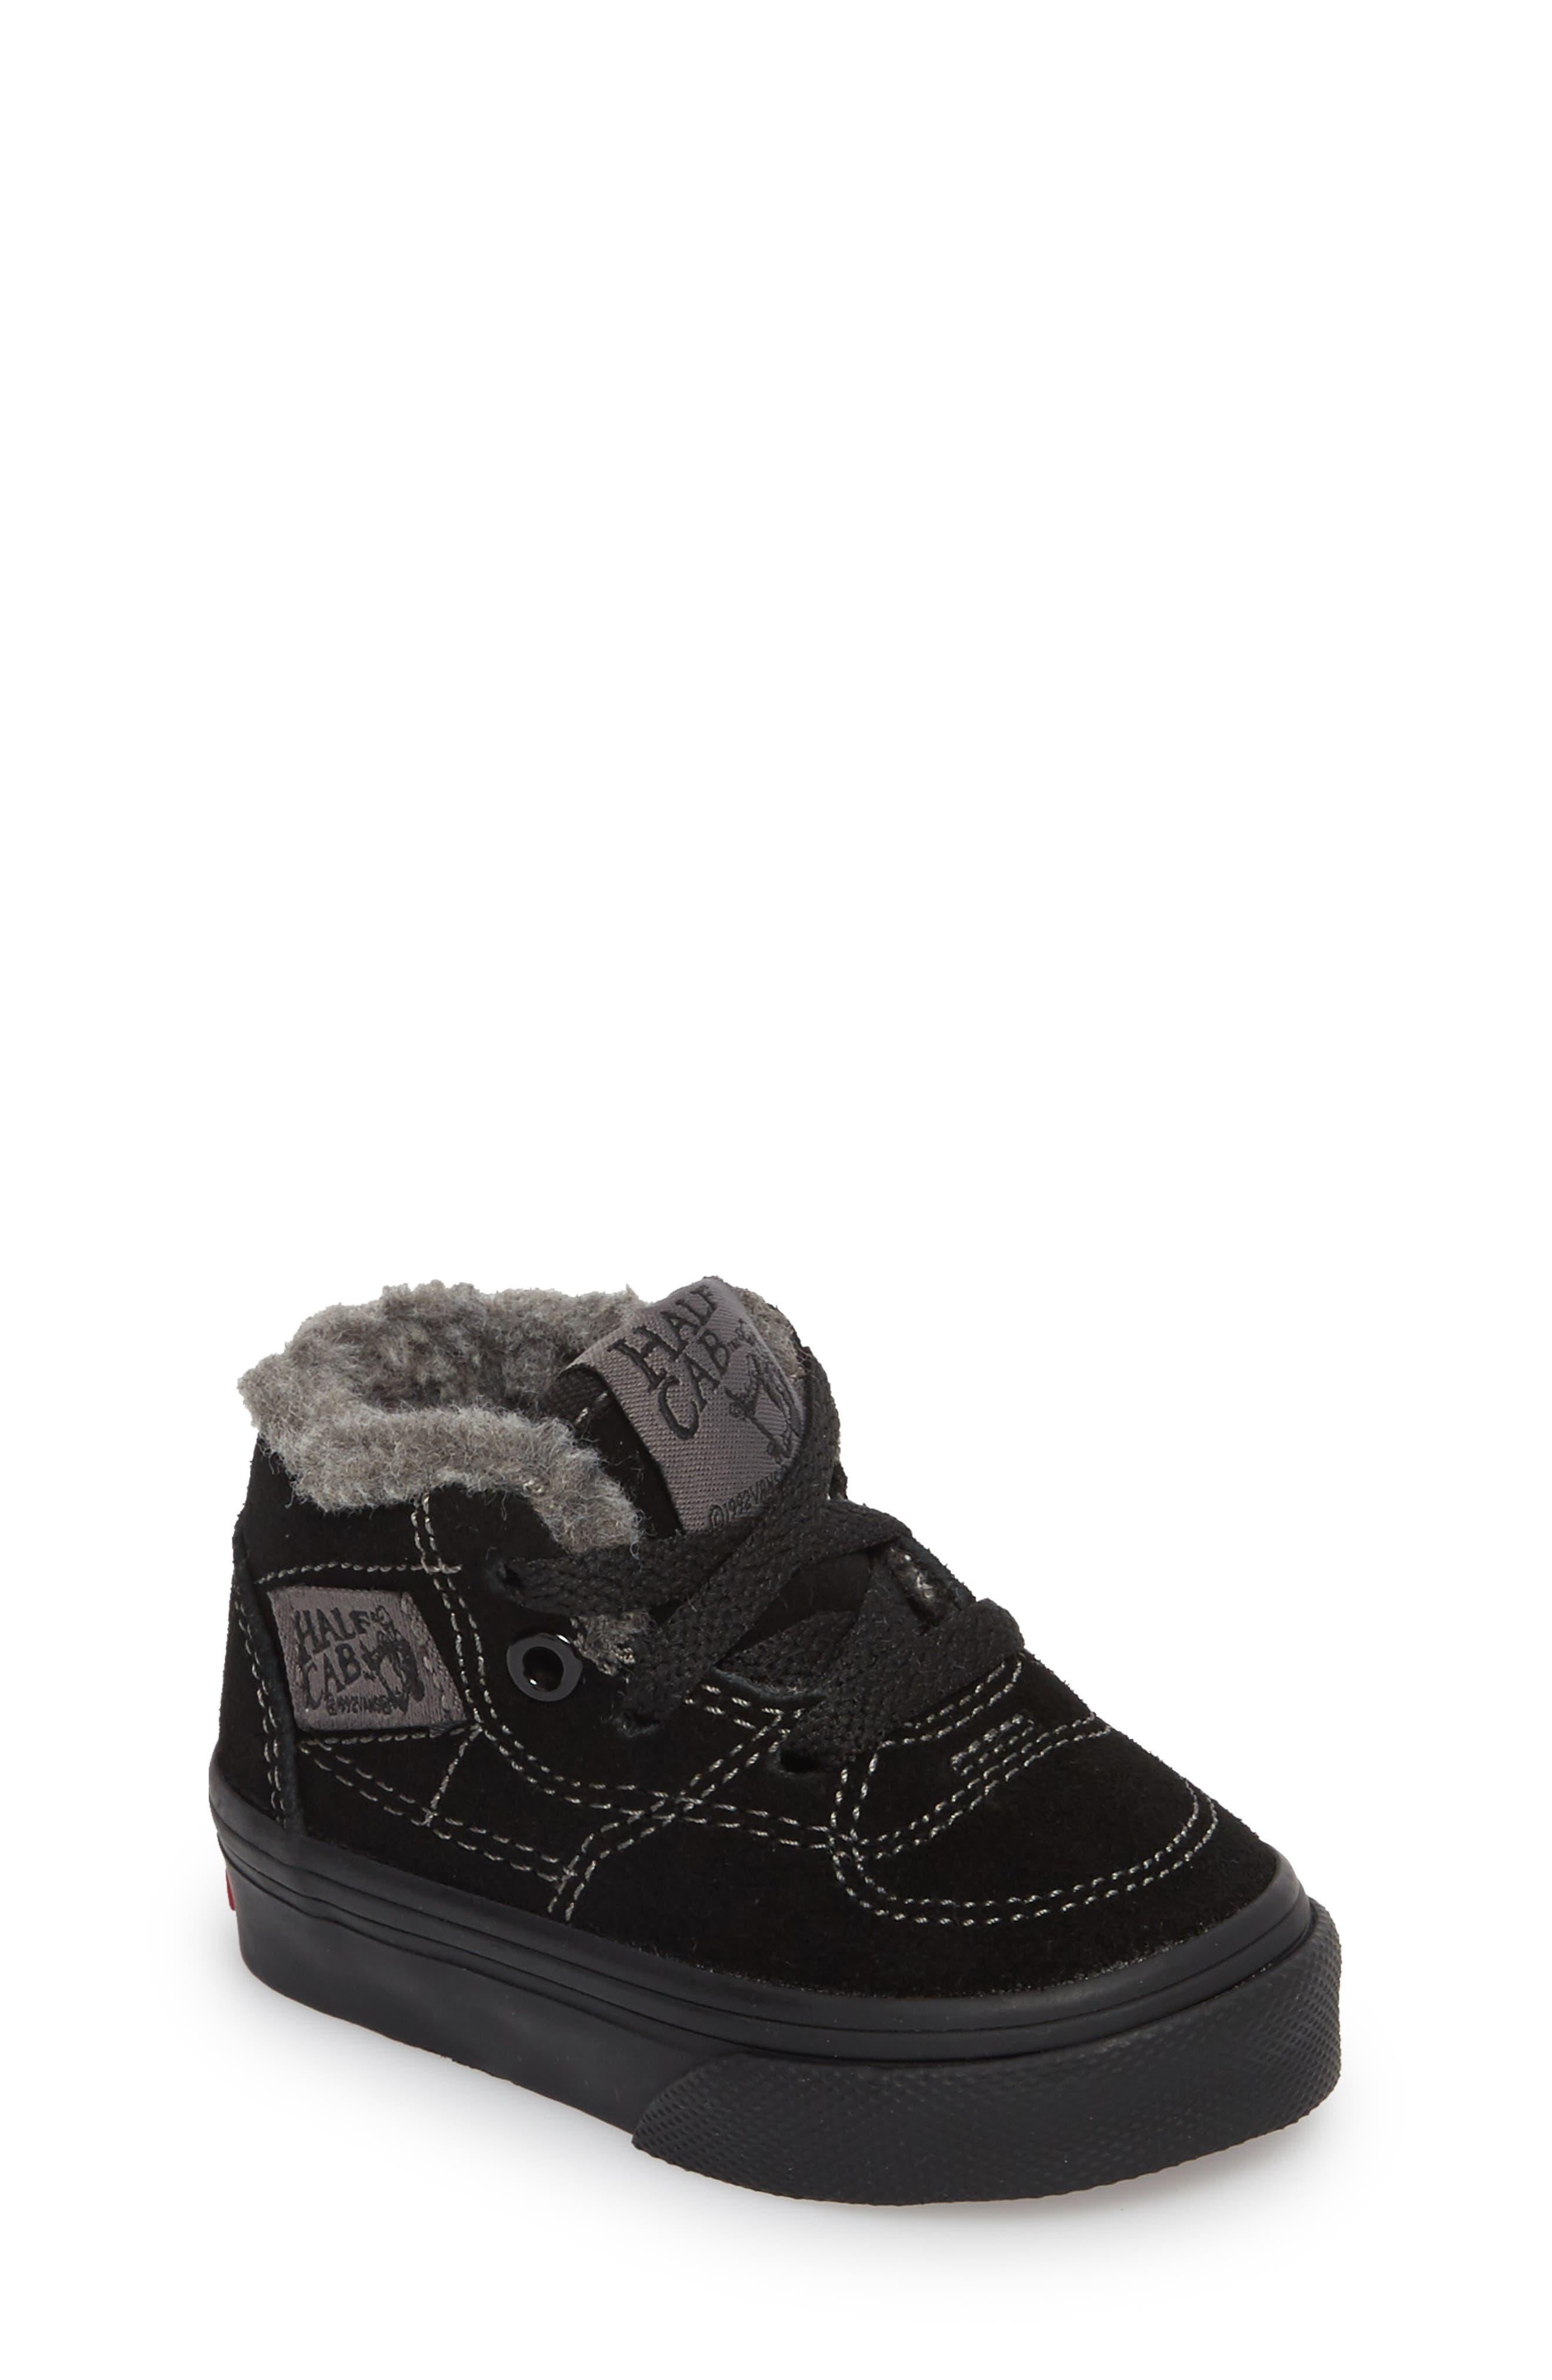 Half Cab Sneaker,                             Main thumbnail 1, color,                             001